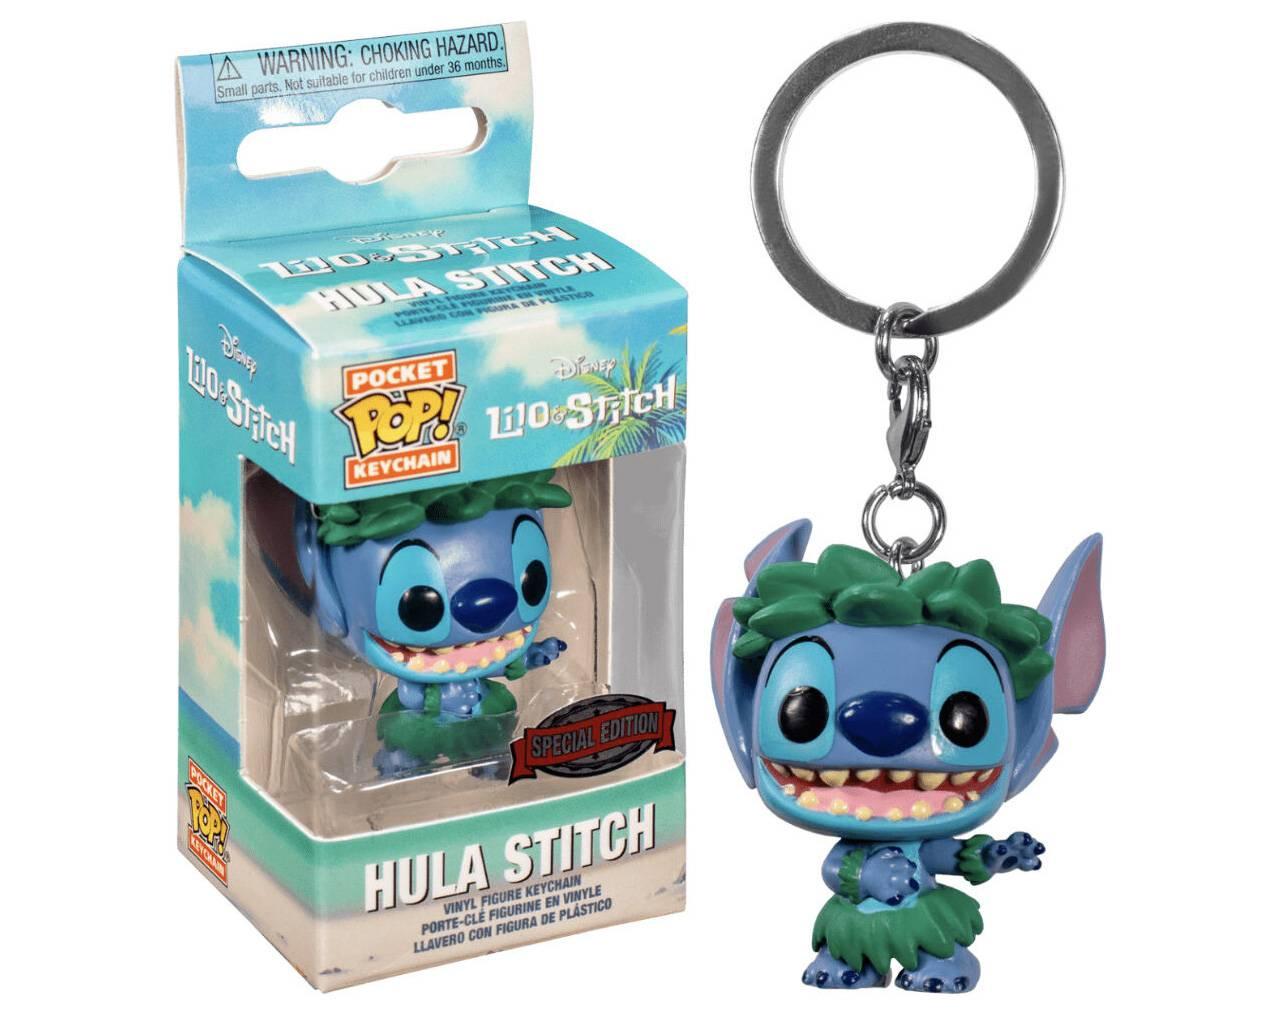 Hula Stitch (Llavero) Pop! Vinyl